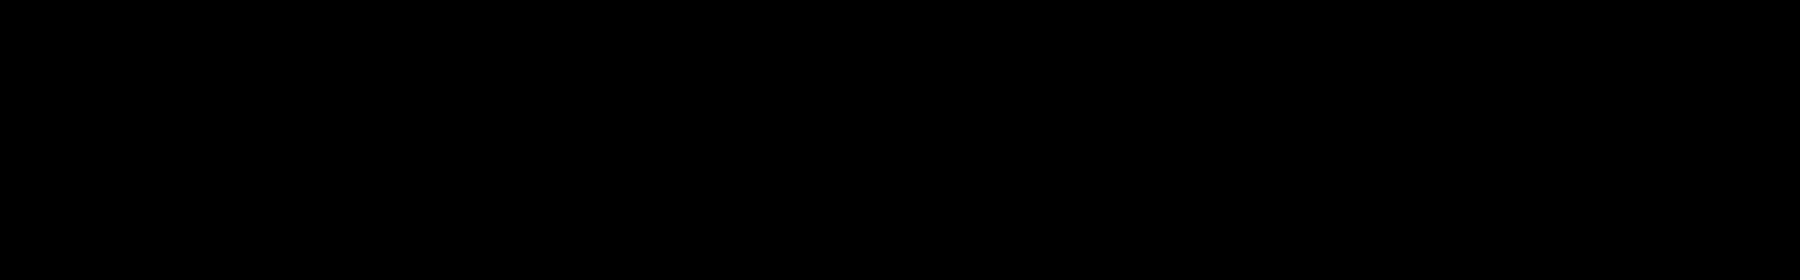 Orbit audio waveform